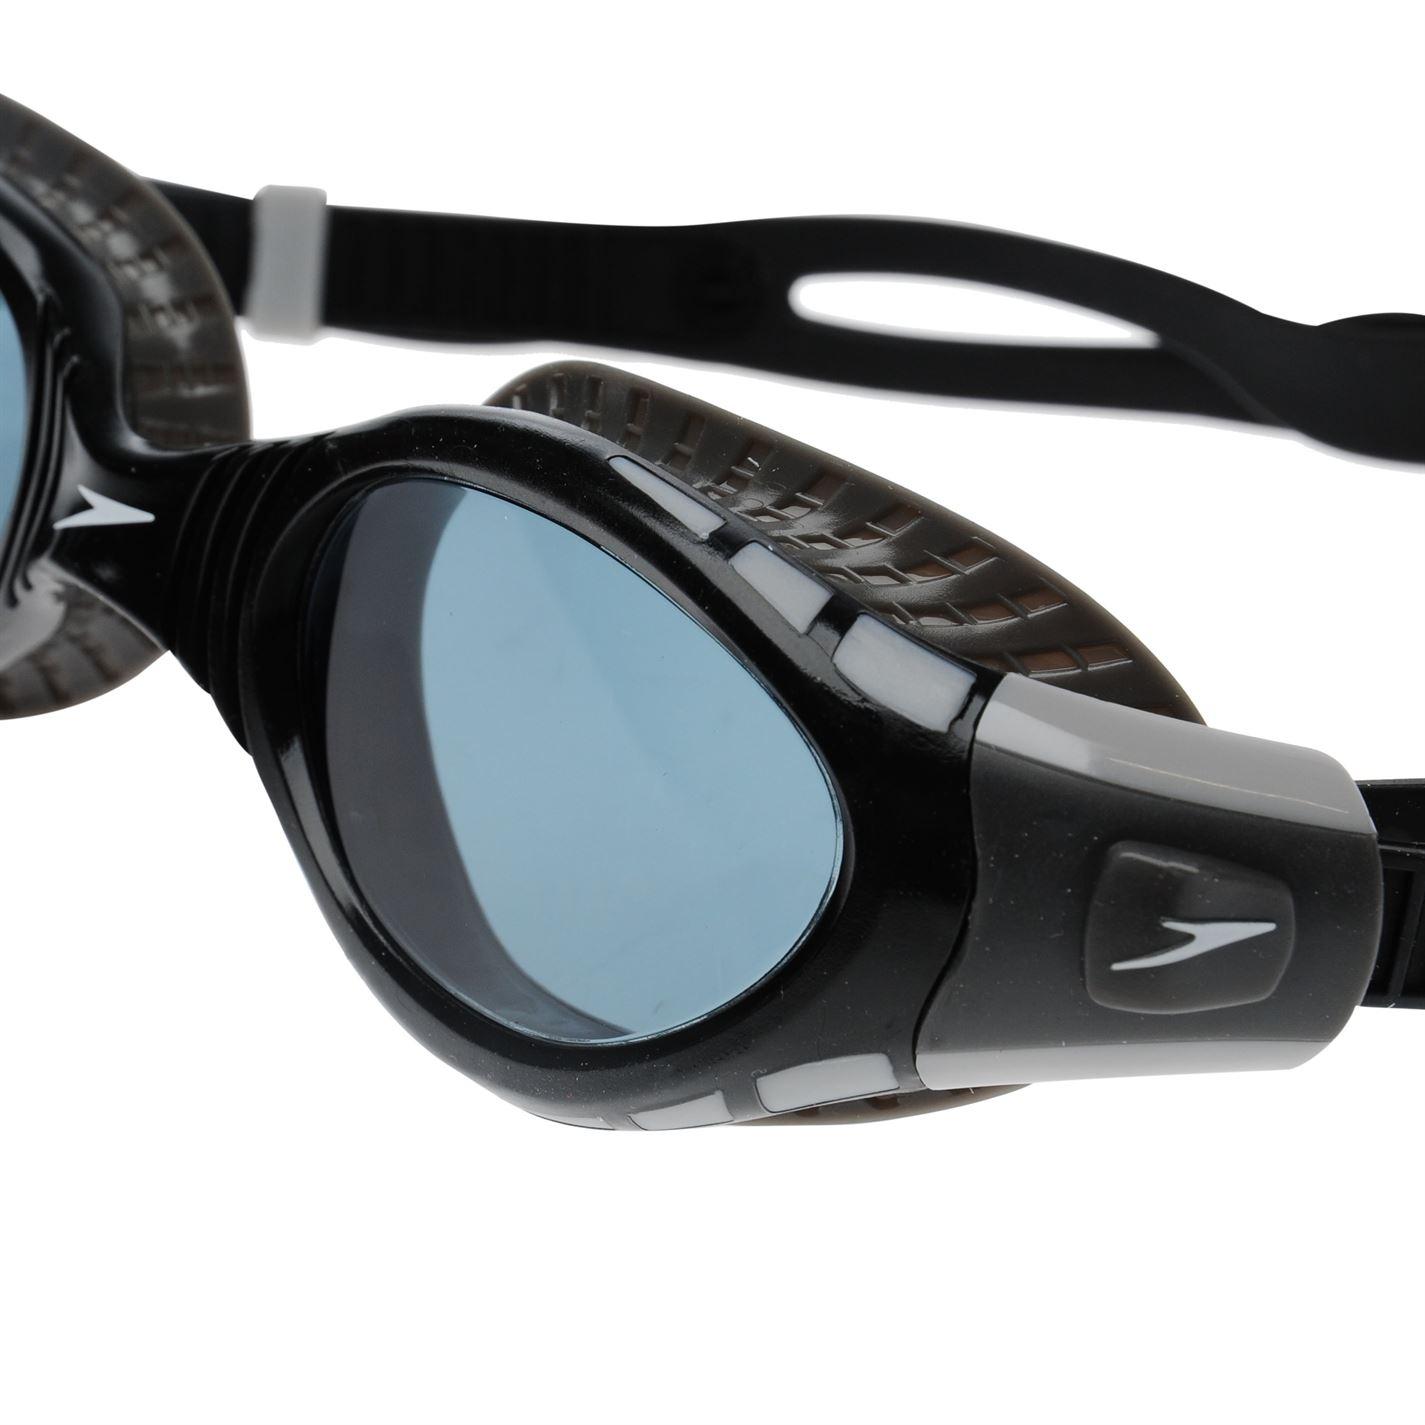 Speedo Mens Futura Bio Goggles Swimming Glass Sports Equipment Accessories  | eBay